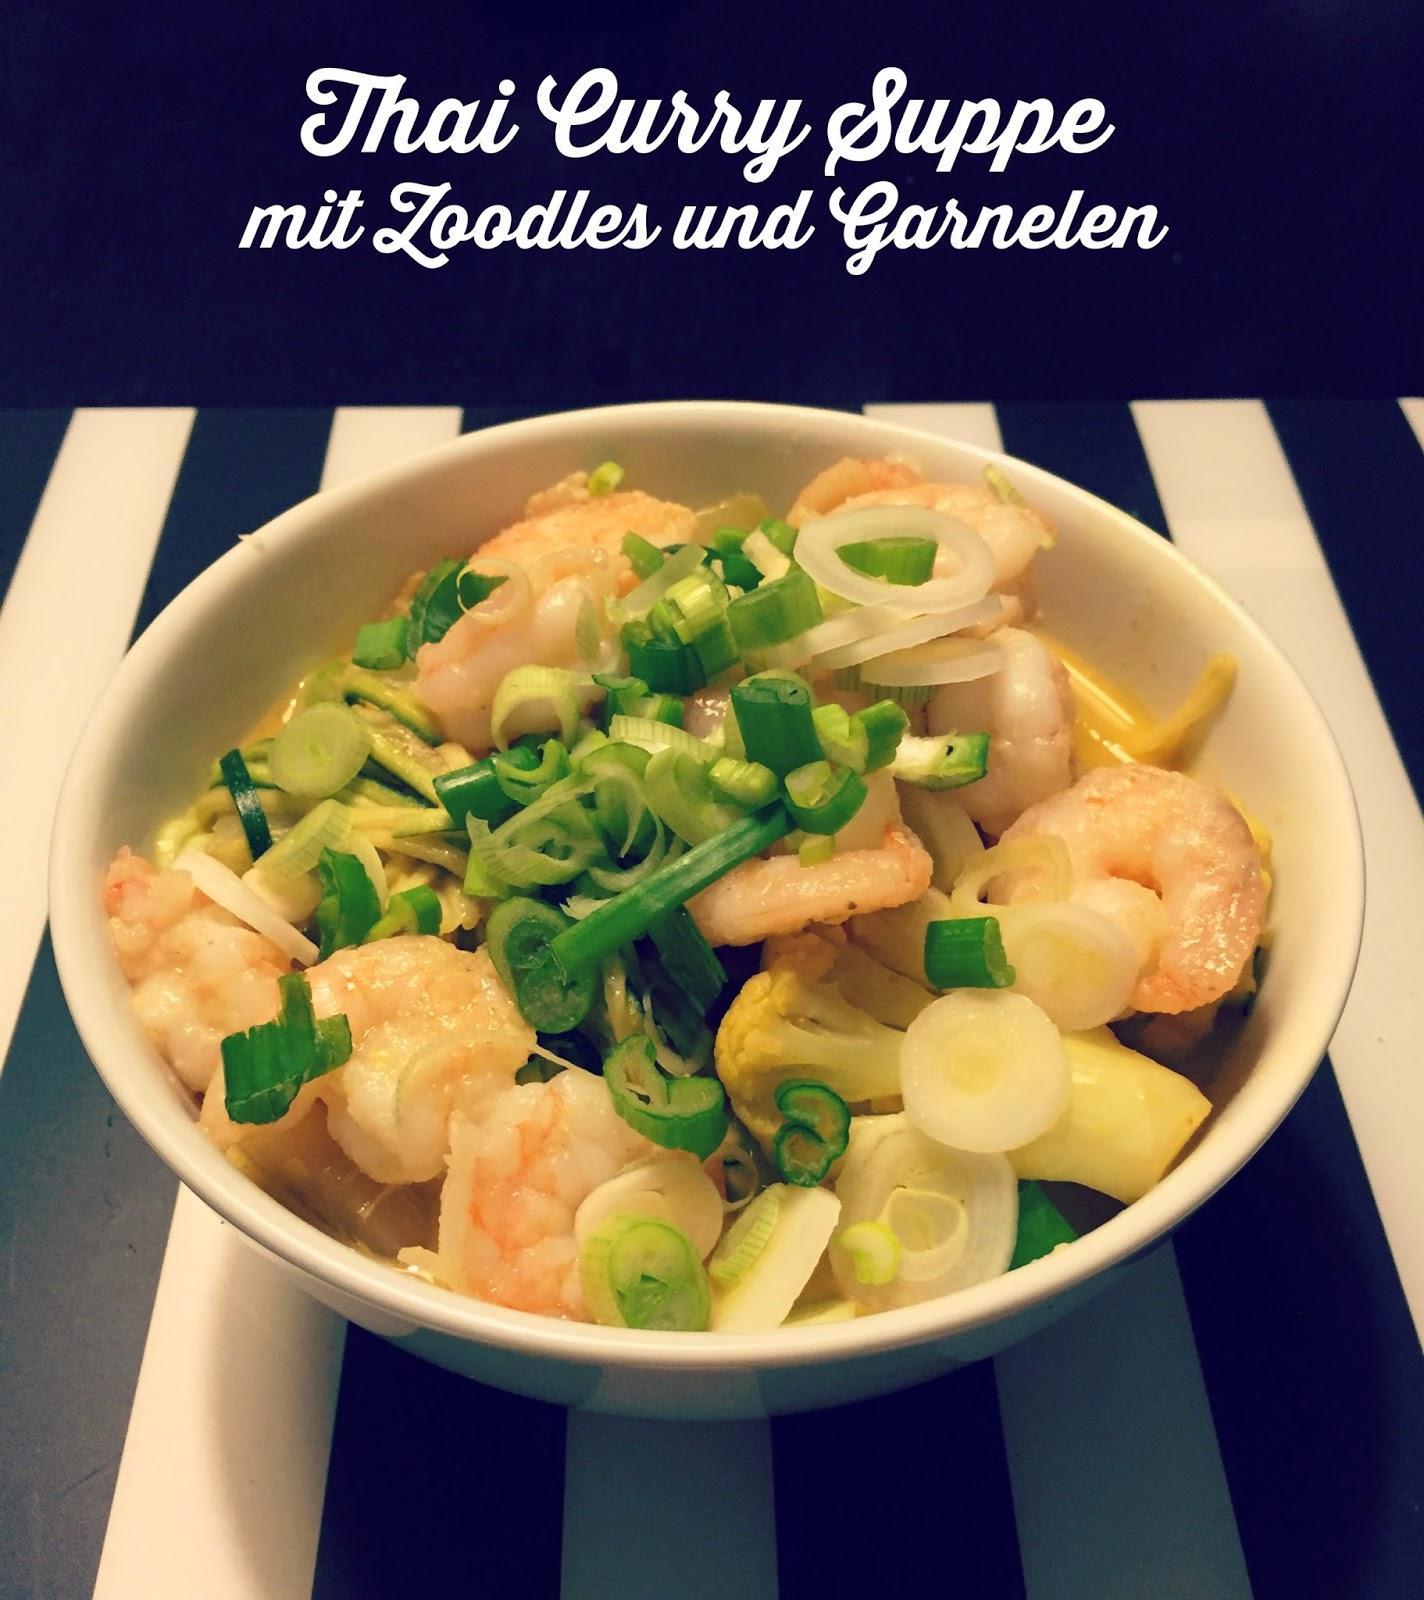 zoodle rezepte part 2 thai curry suppe mit zoodles garnelen superzisch. Black Bedroom Furniture Sets. Home Design Ideas